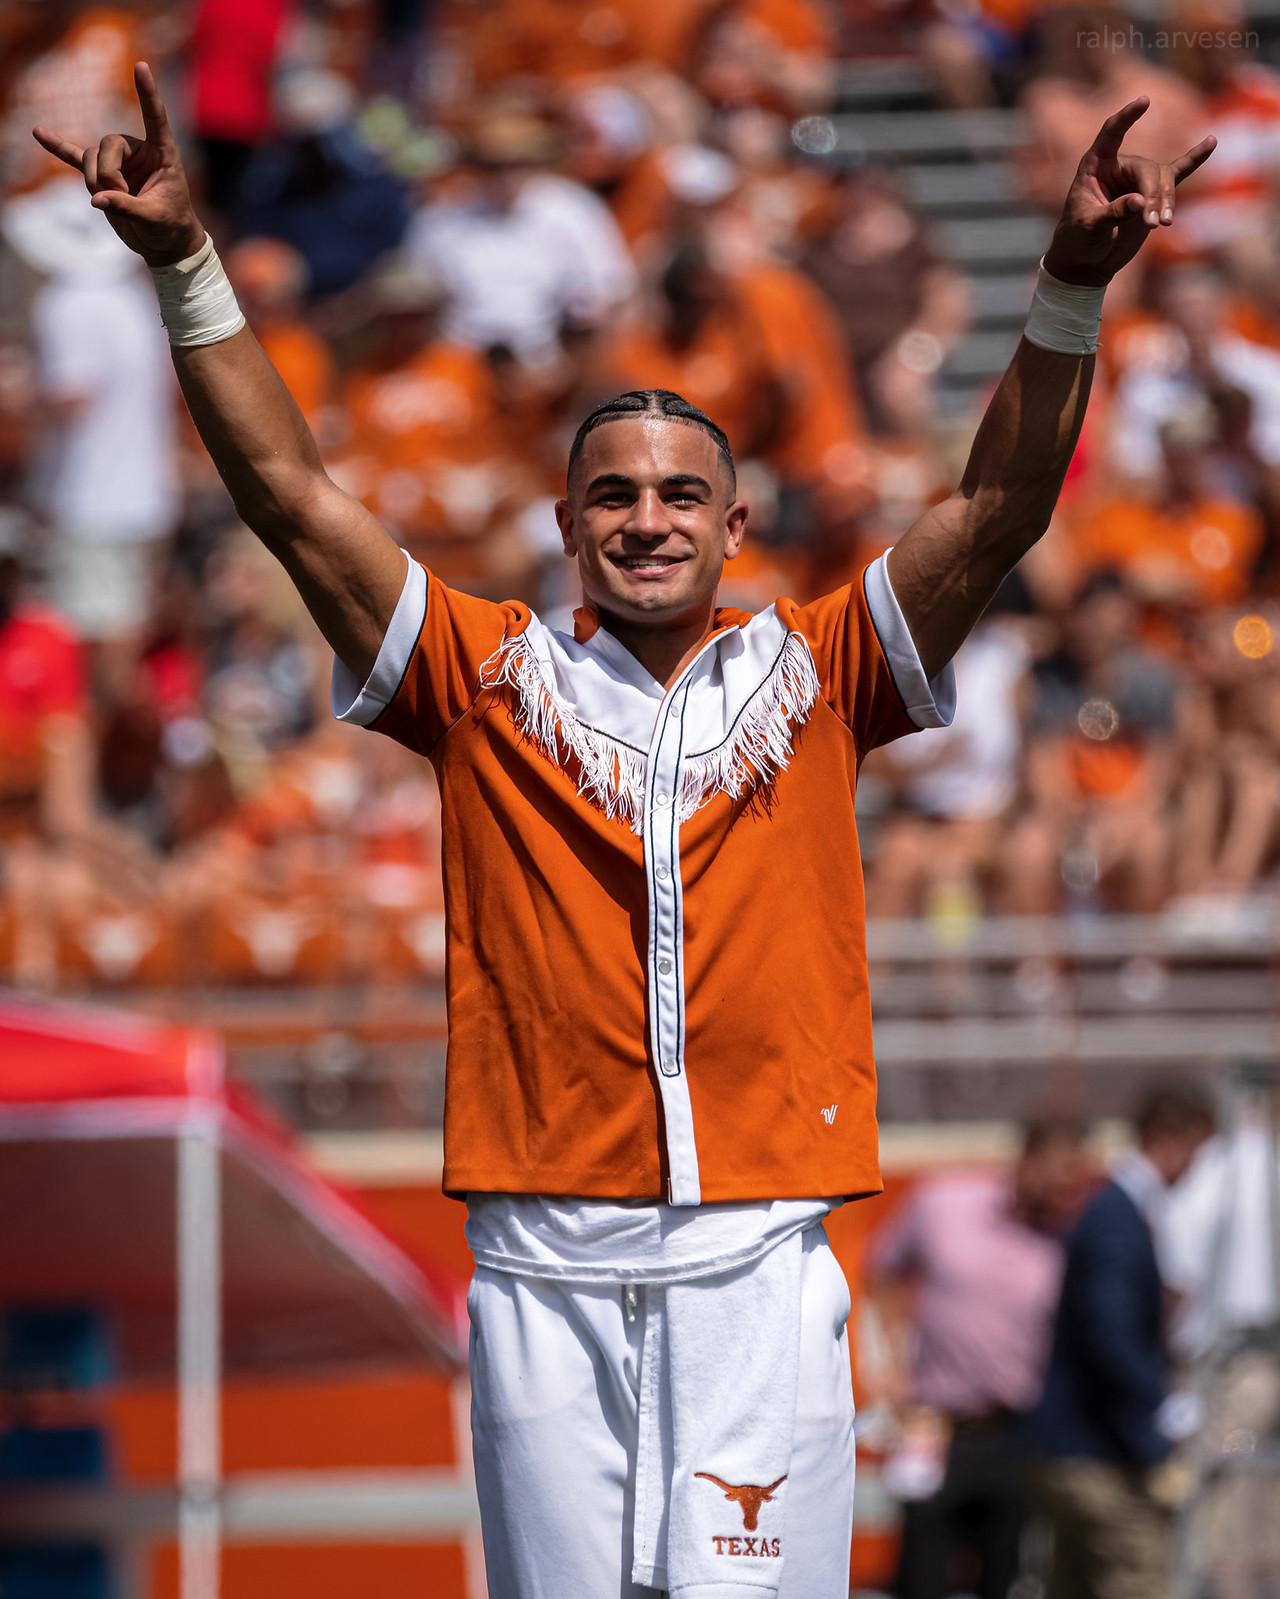 Texas Cheer   Texas Review   Ralph Arvesen